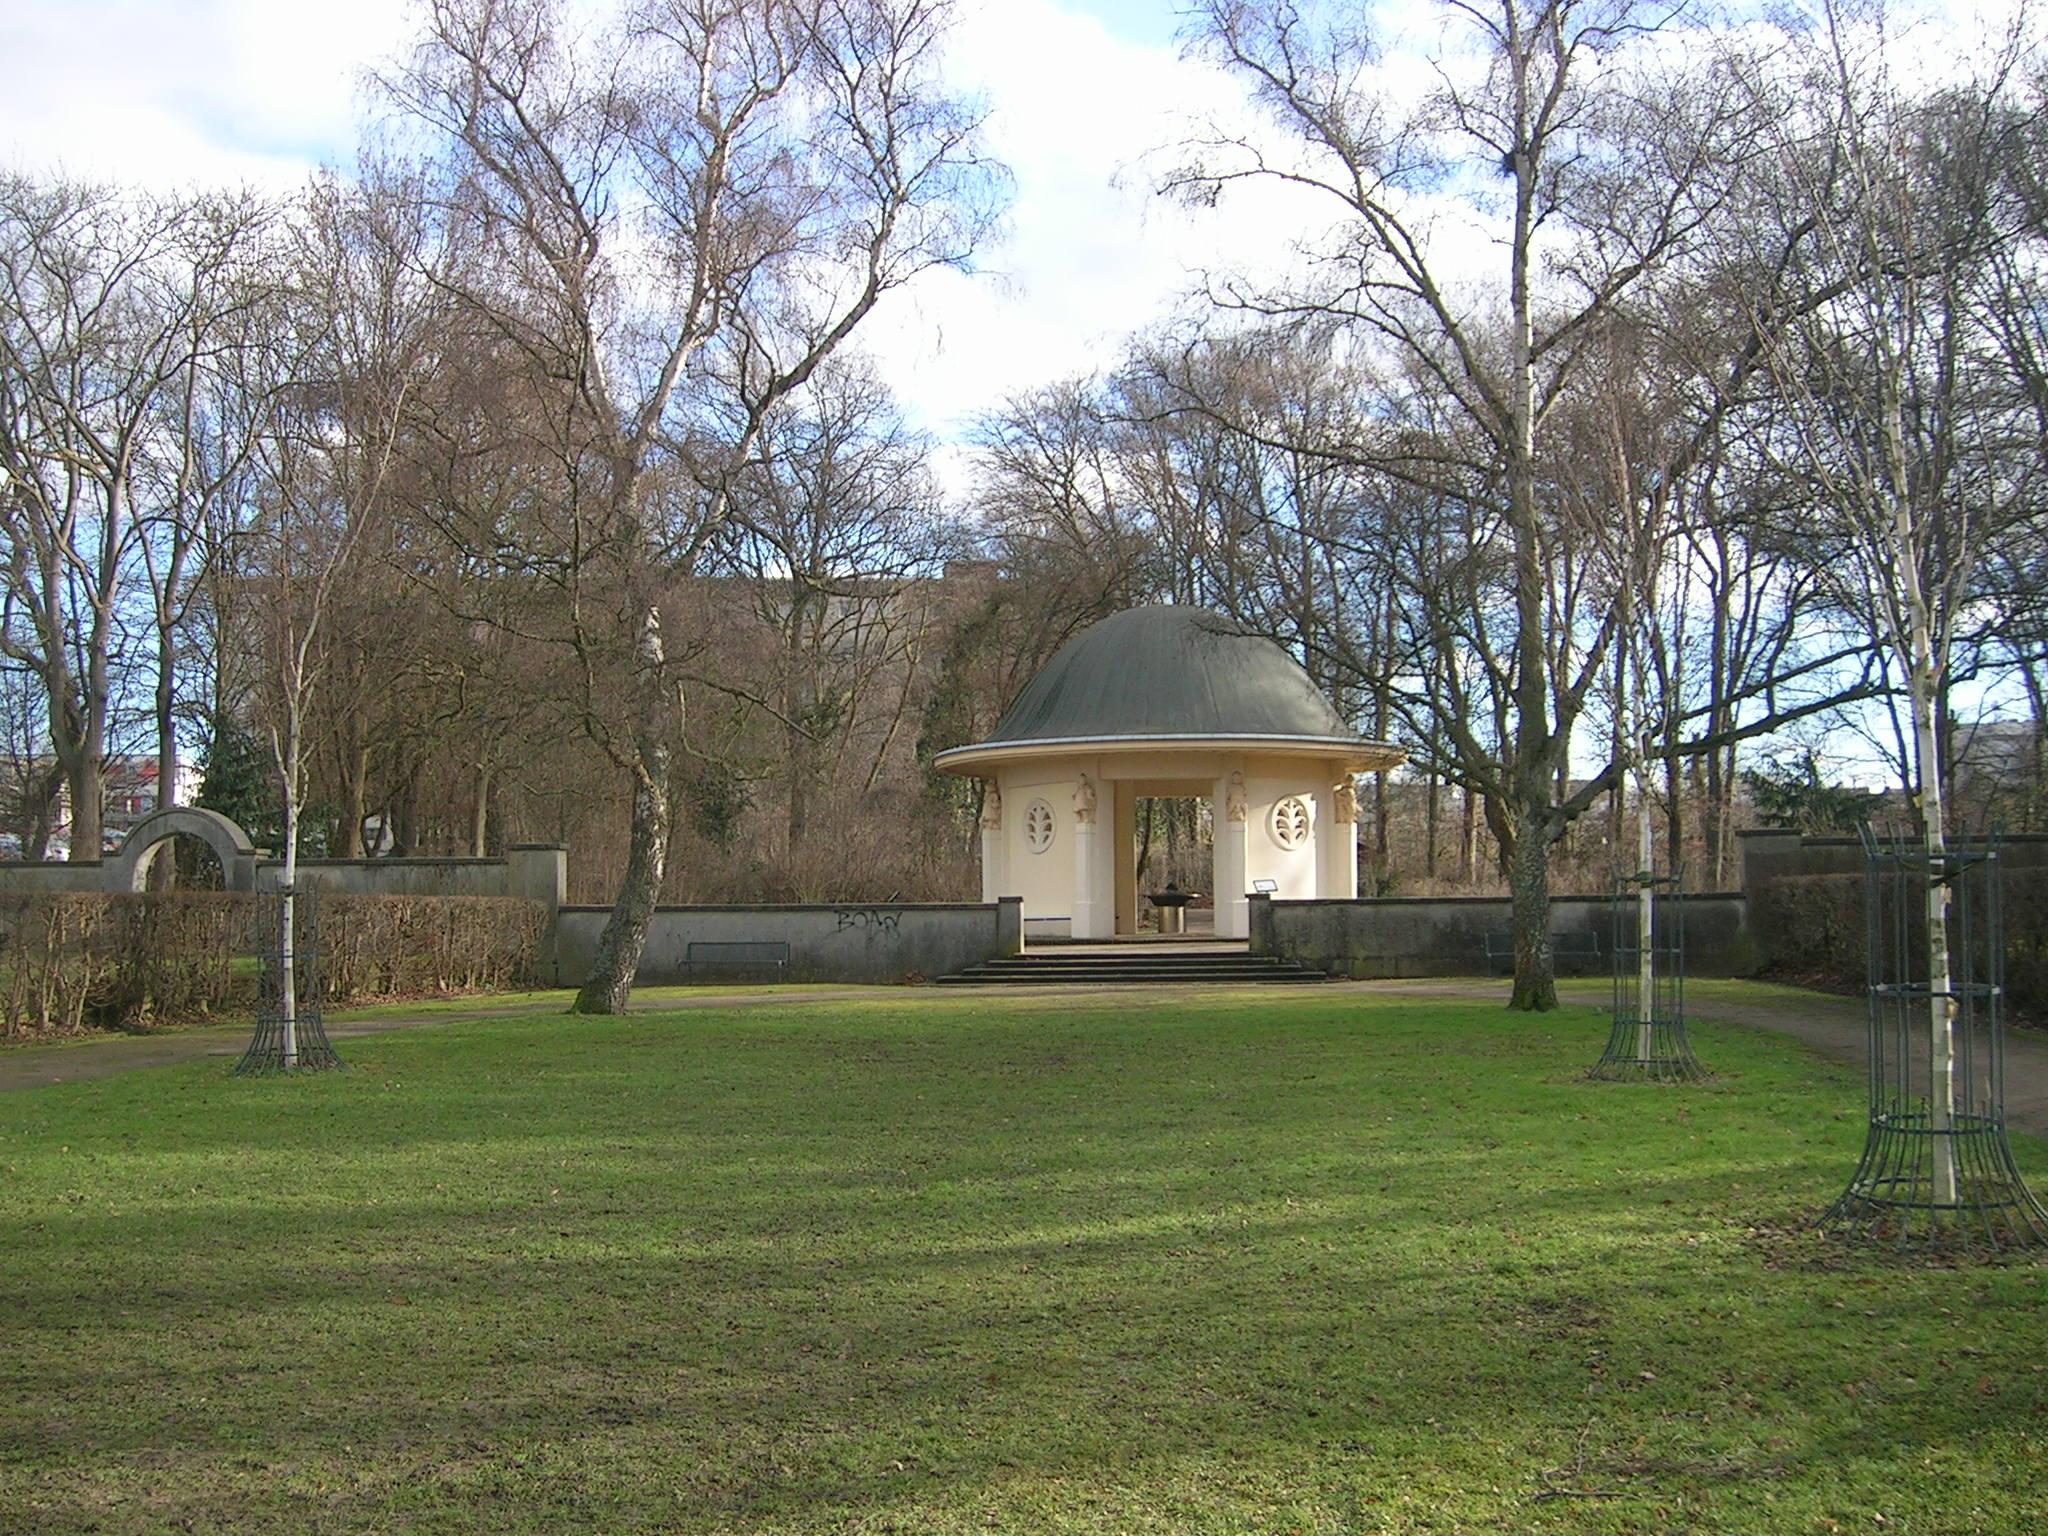 2014 BrunnentempelchenVolkspark